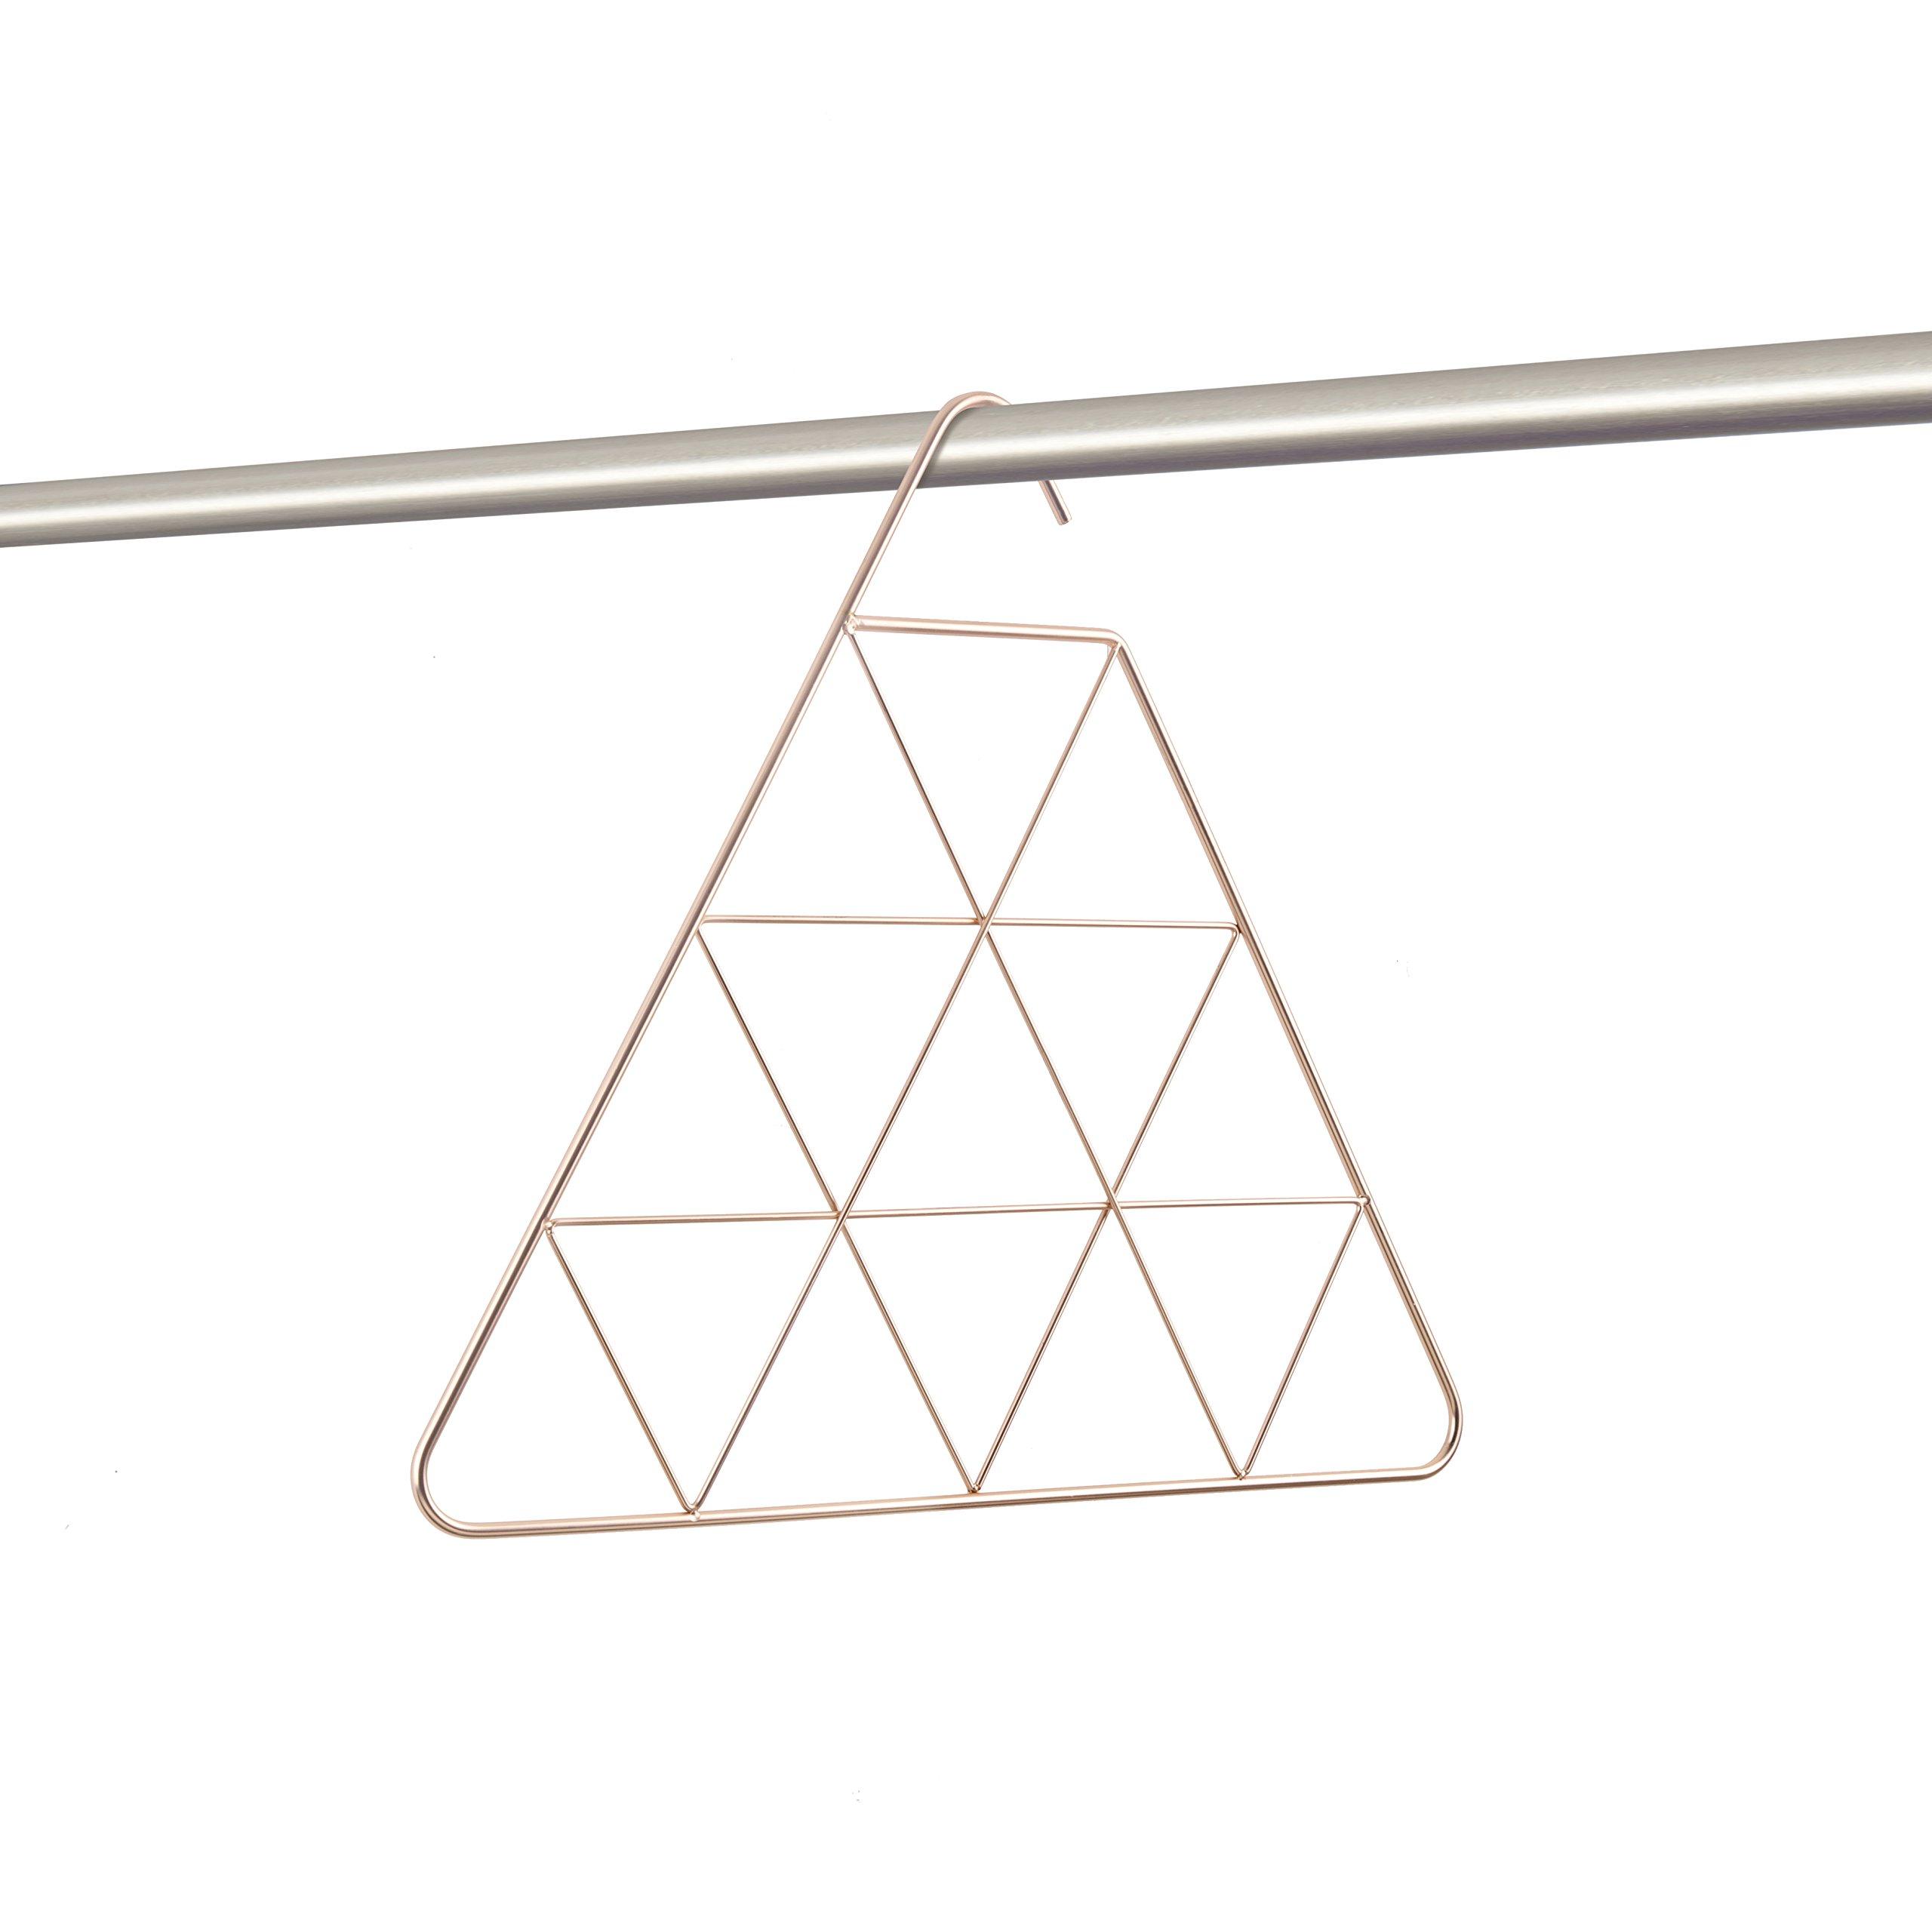 Umbra Pendant Triangular Copper Scarf Hanger/Accessory Hanger, Copper by Umbra (Image #2)